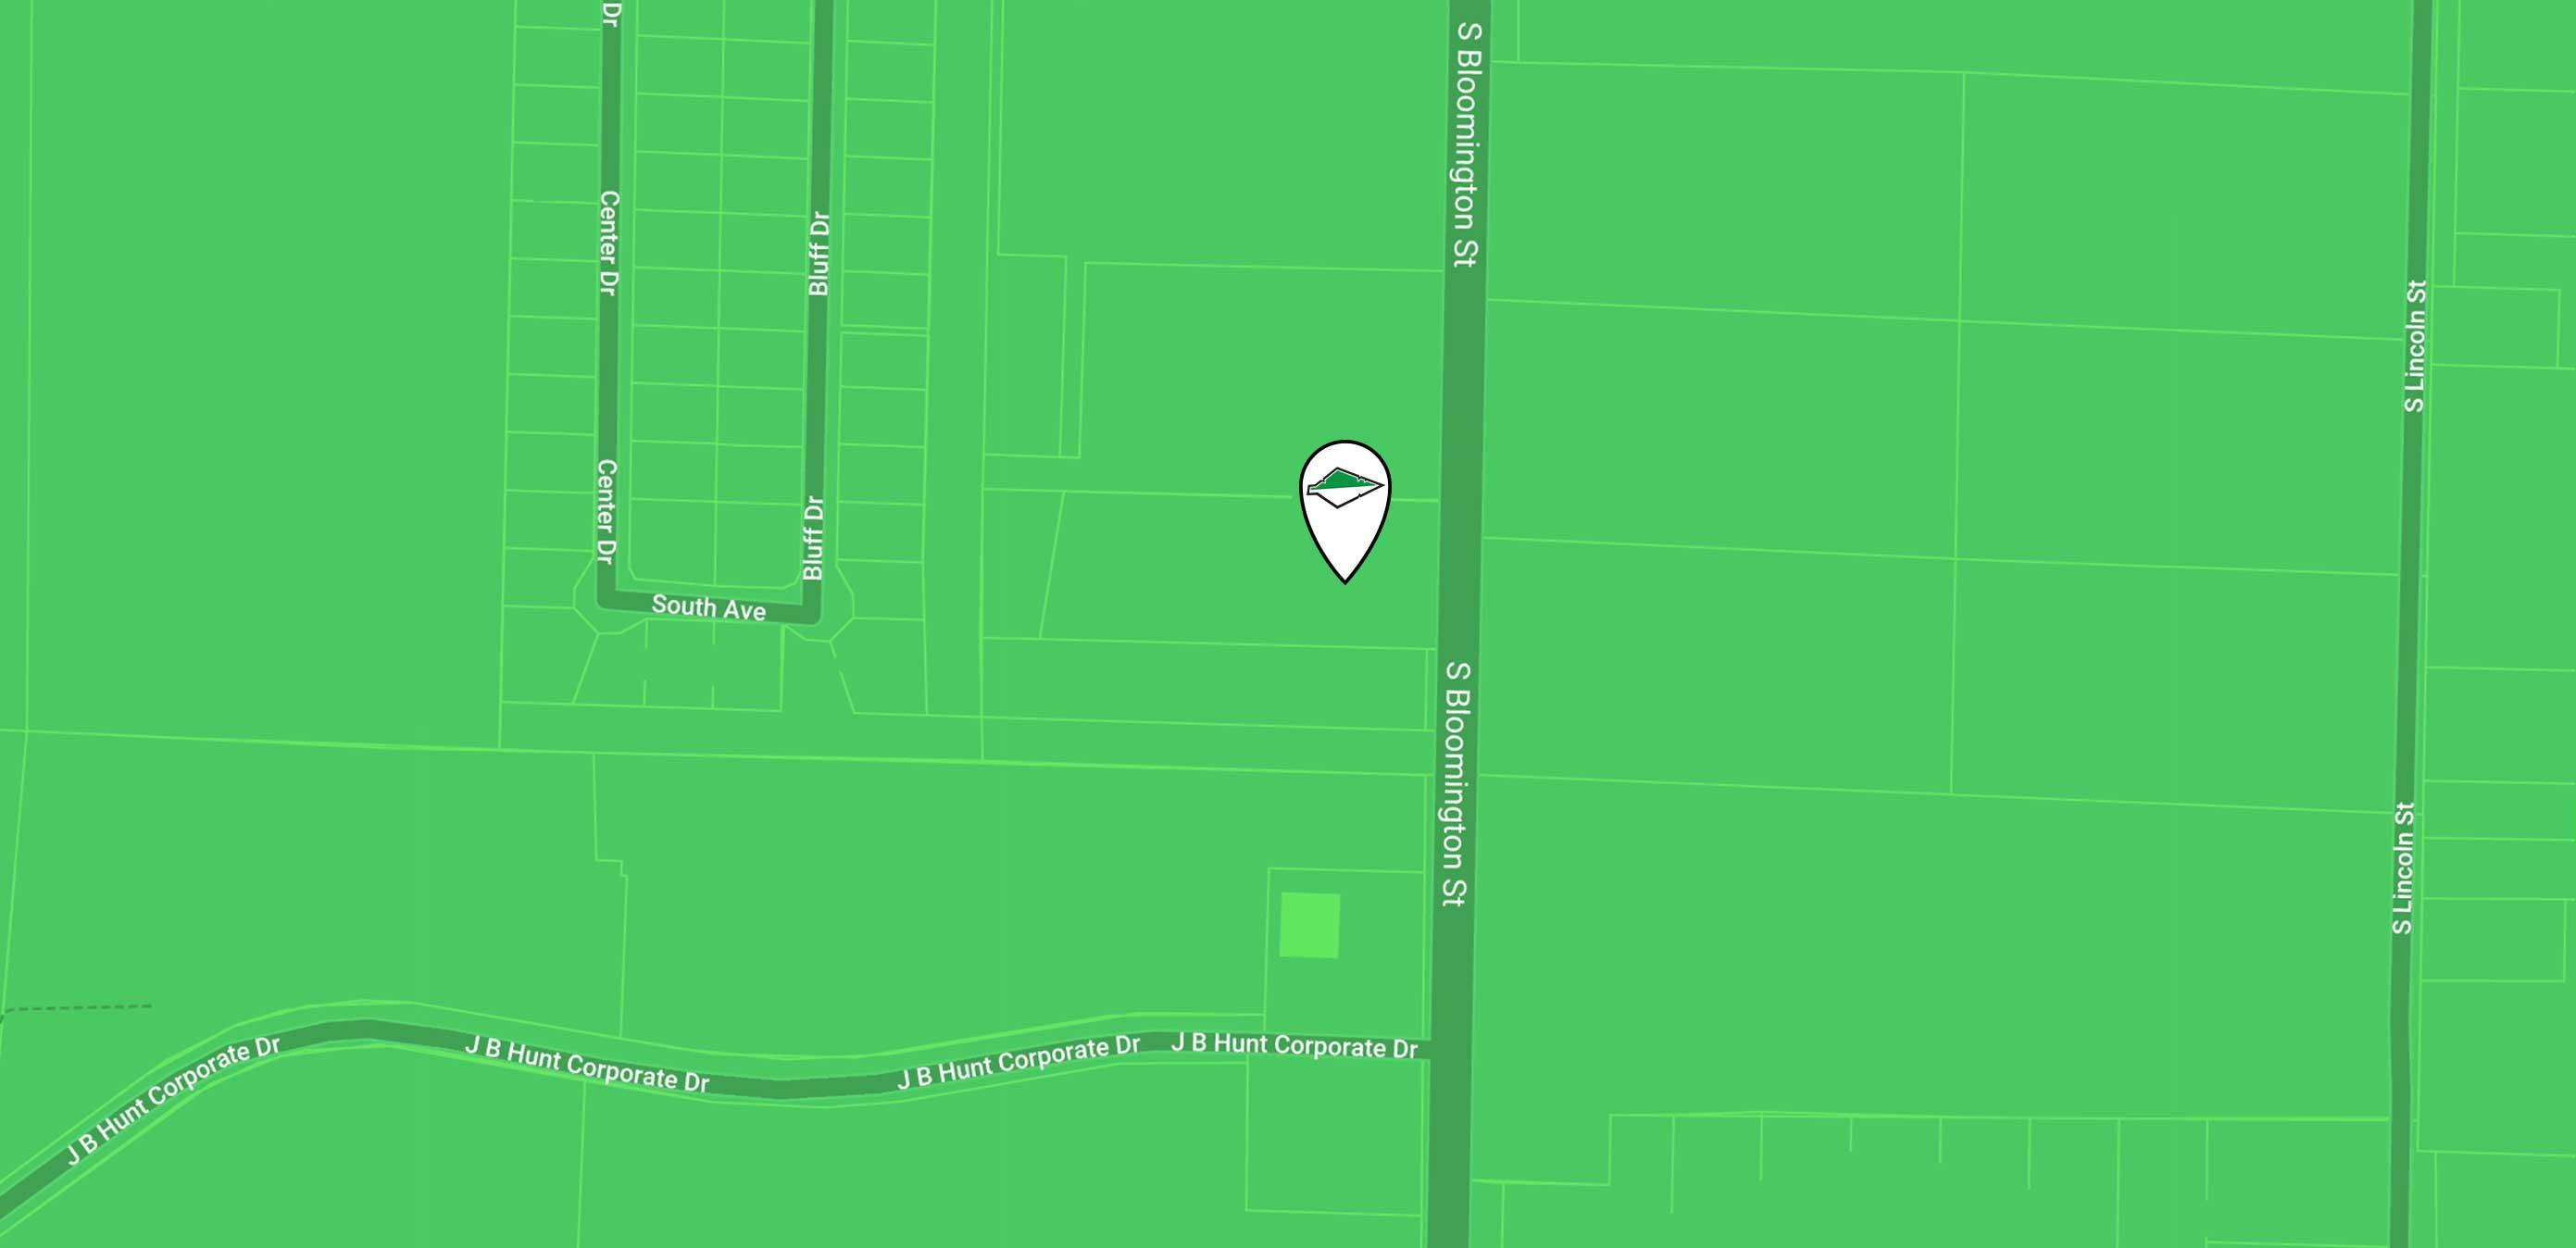 Arrowhead Building Supplies Location